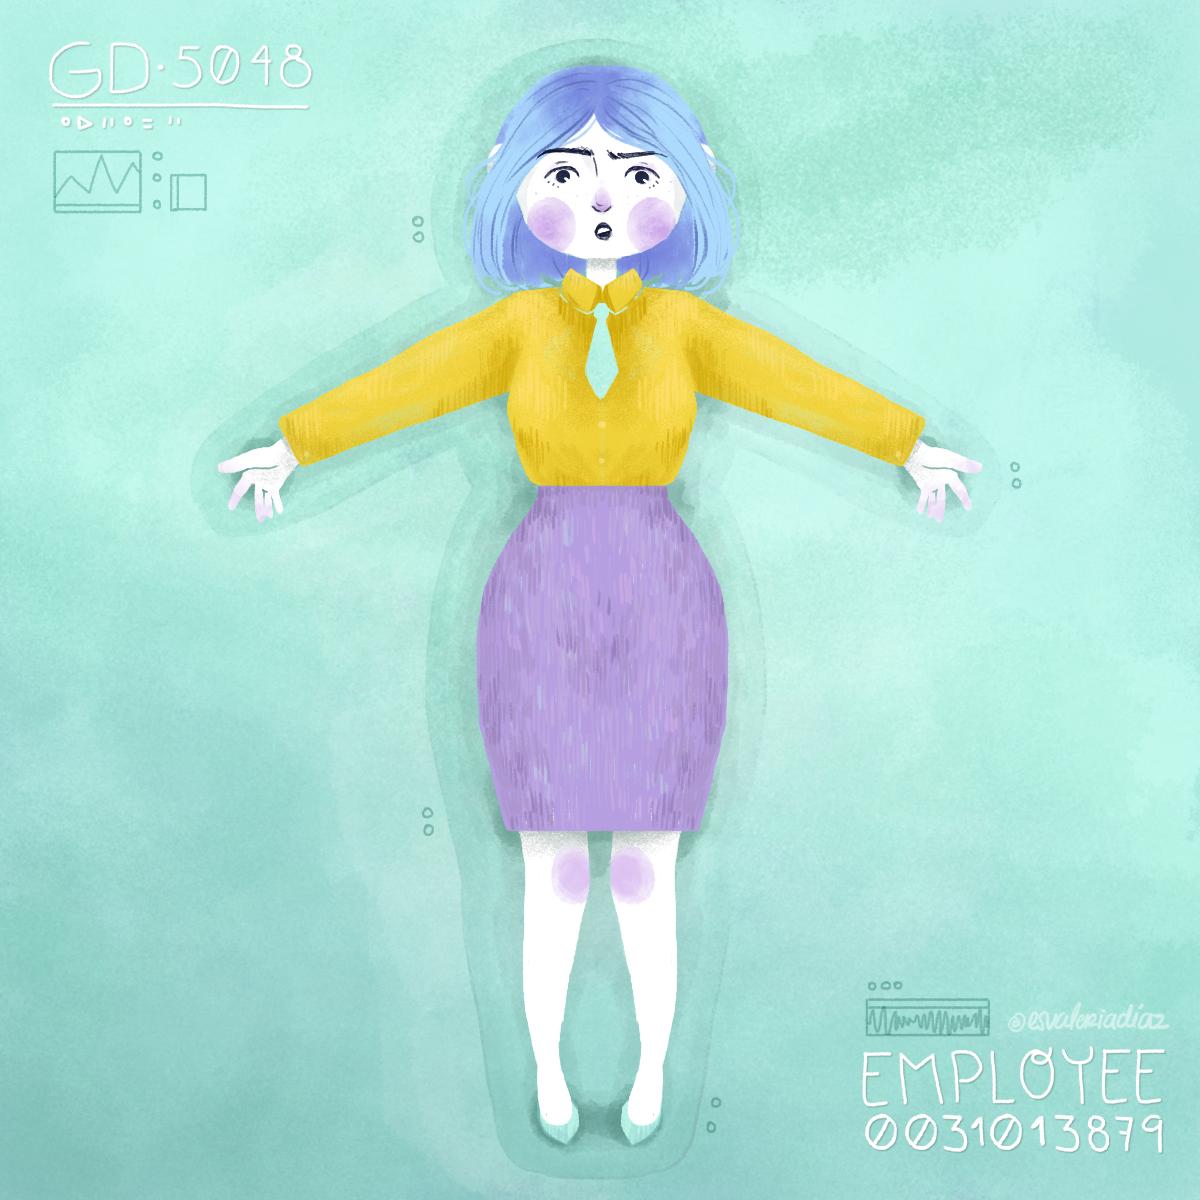 16. The eternal employee